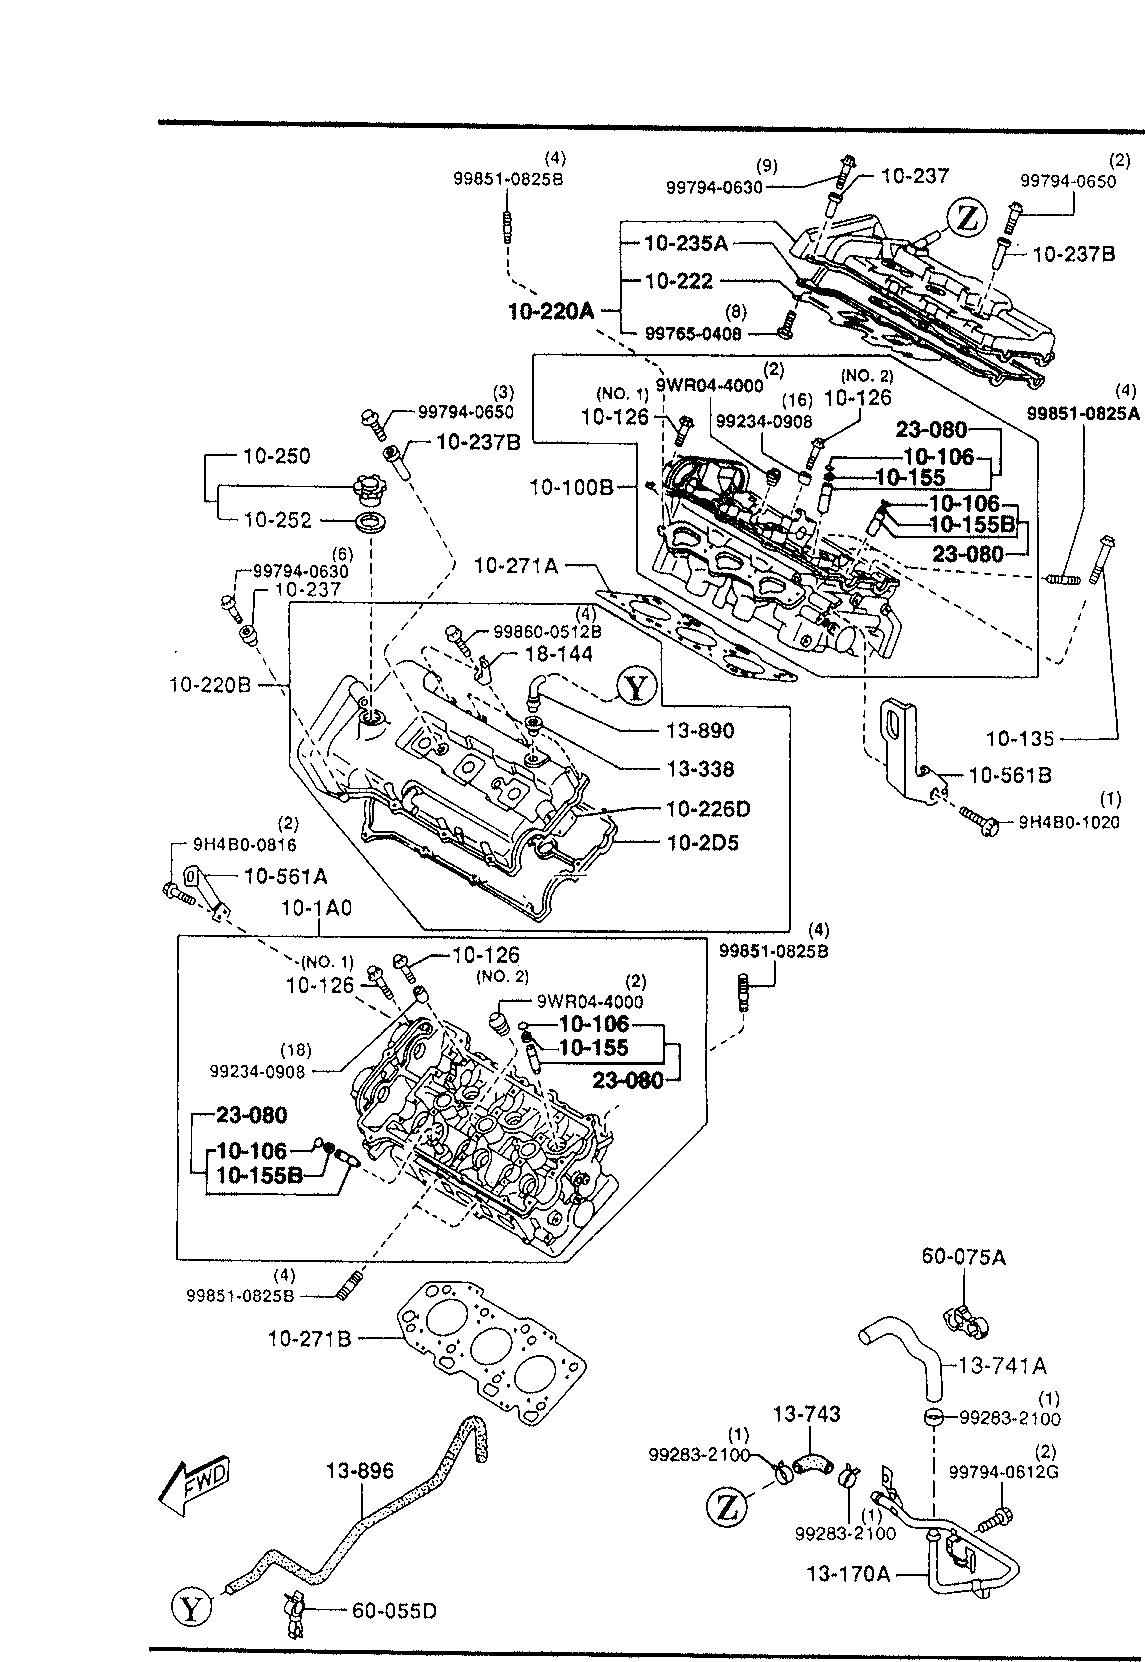 Usa 1998 Millenia Gasoline Engine V6 Cylinder Transmission 1010b Head Diagram List Of Parts